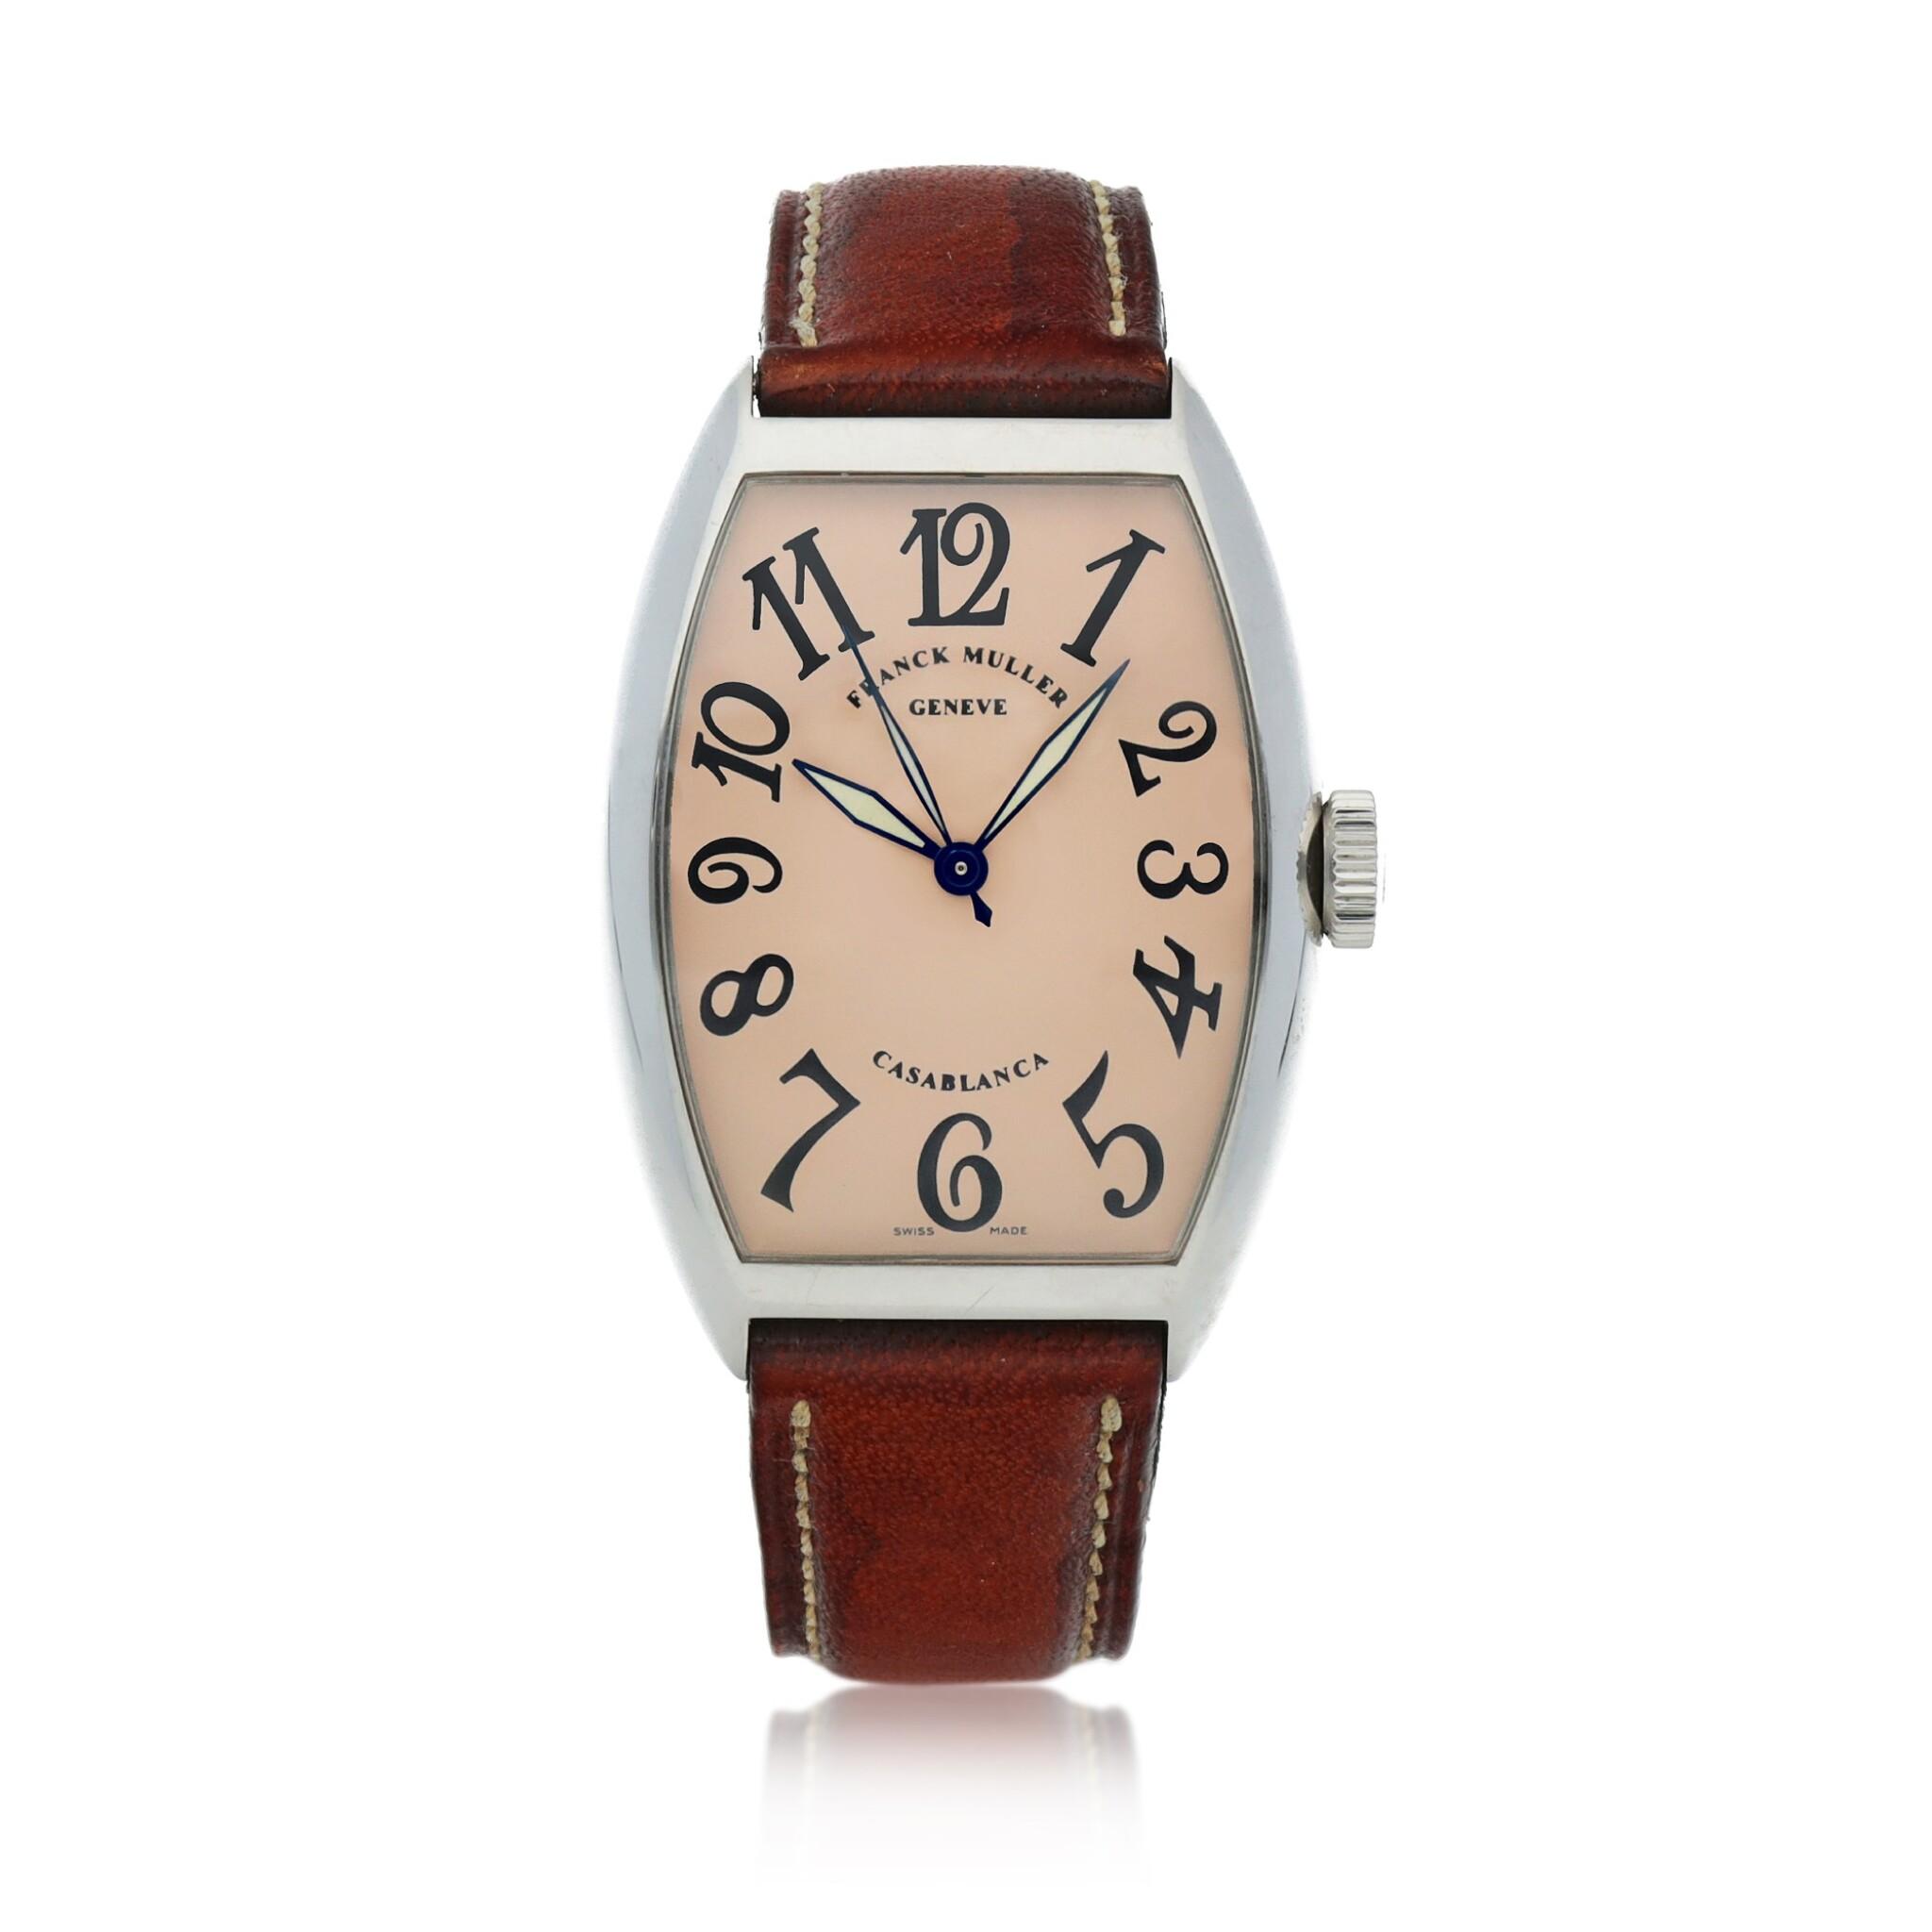 View full screen - View 1 of Lot 545. Casablanca, Ref. 5850 Stainless steel wristwatch Circa 2002   Franck Muller 5850型號「Casablanca」精鋼腕錶,年份約2002.